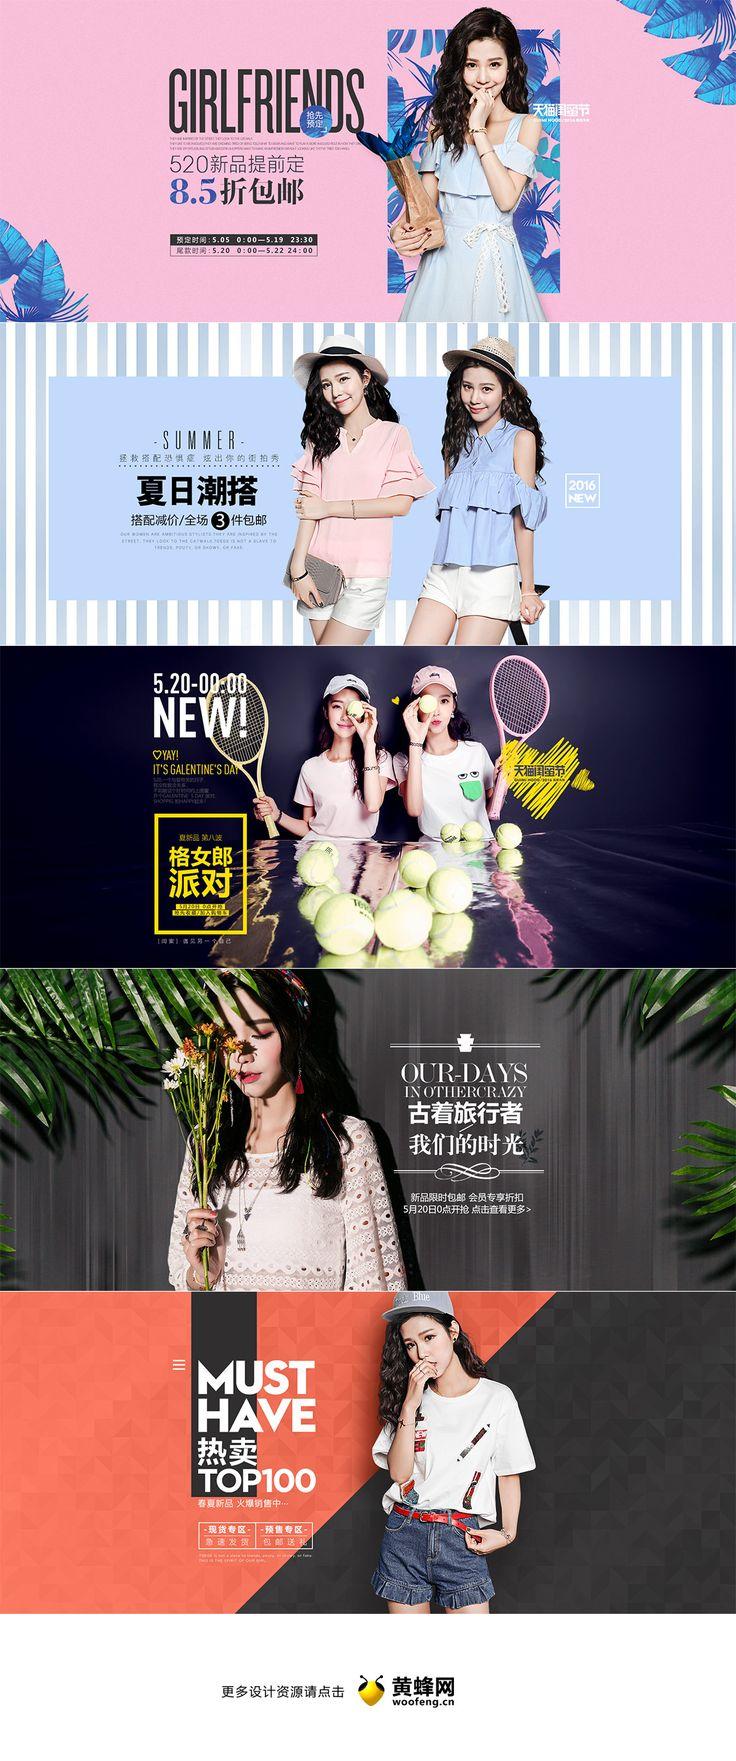 七格格女装520闺蜜节banner设计,来源自黄蜂网http://woofeng.cn/